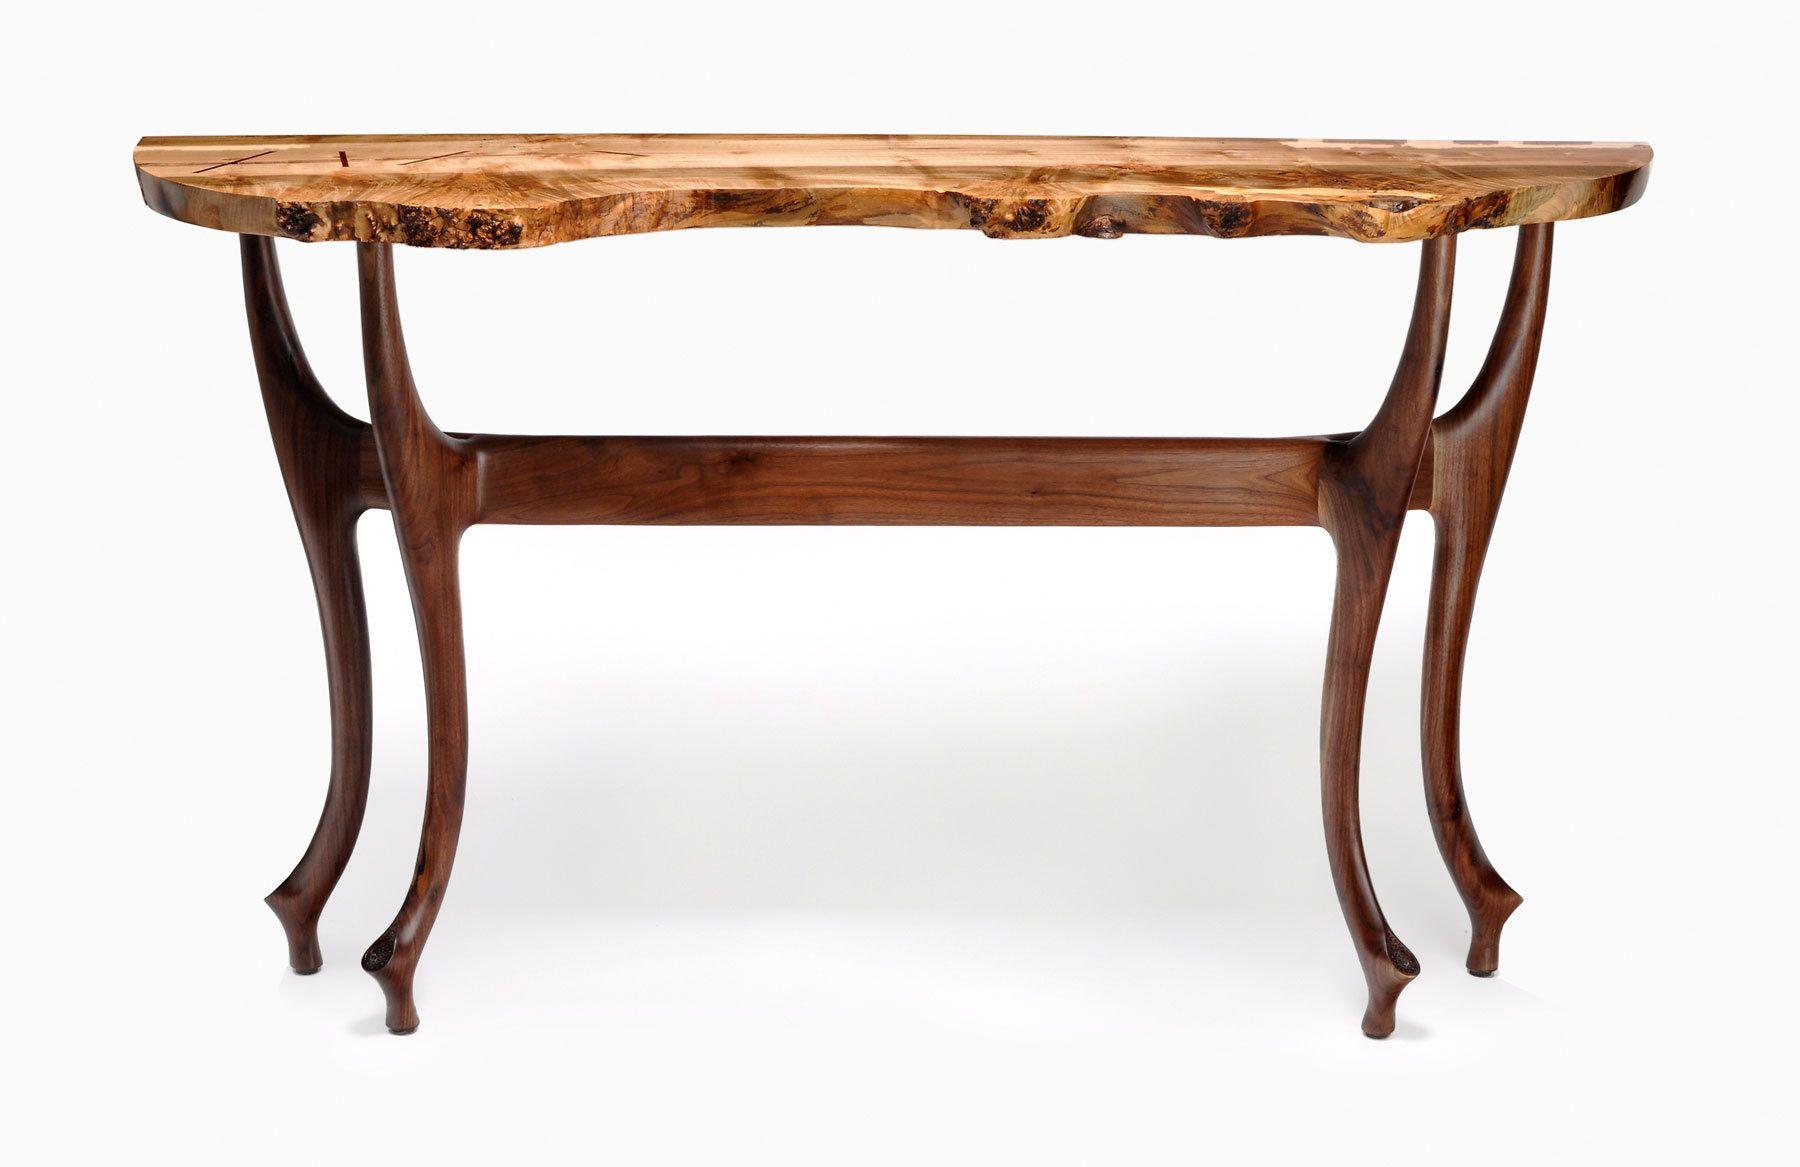 Pogonia table